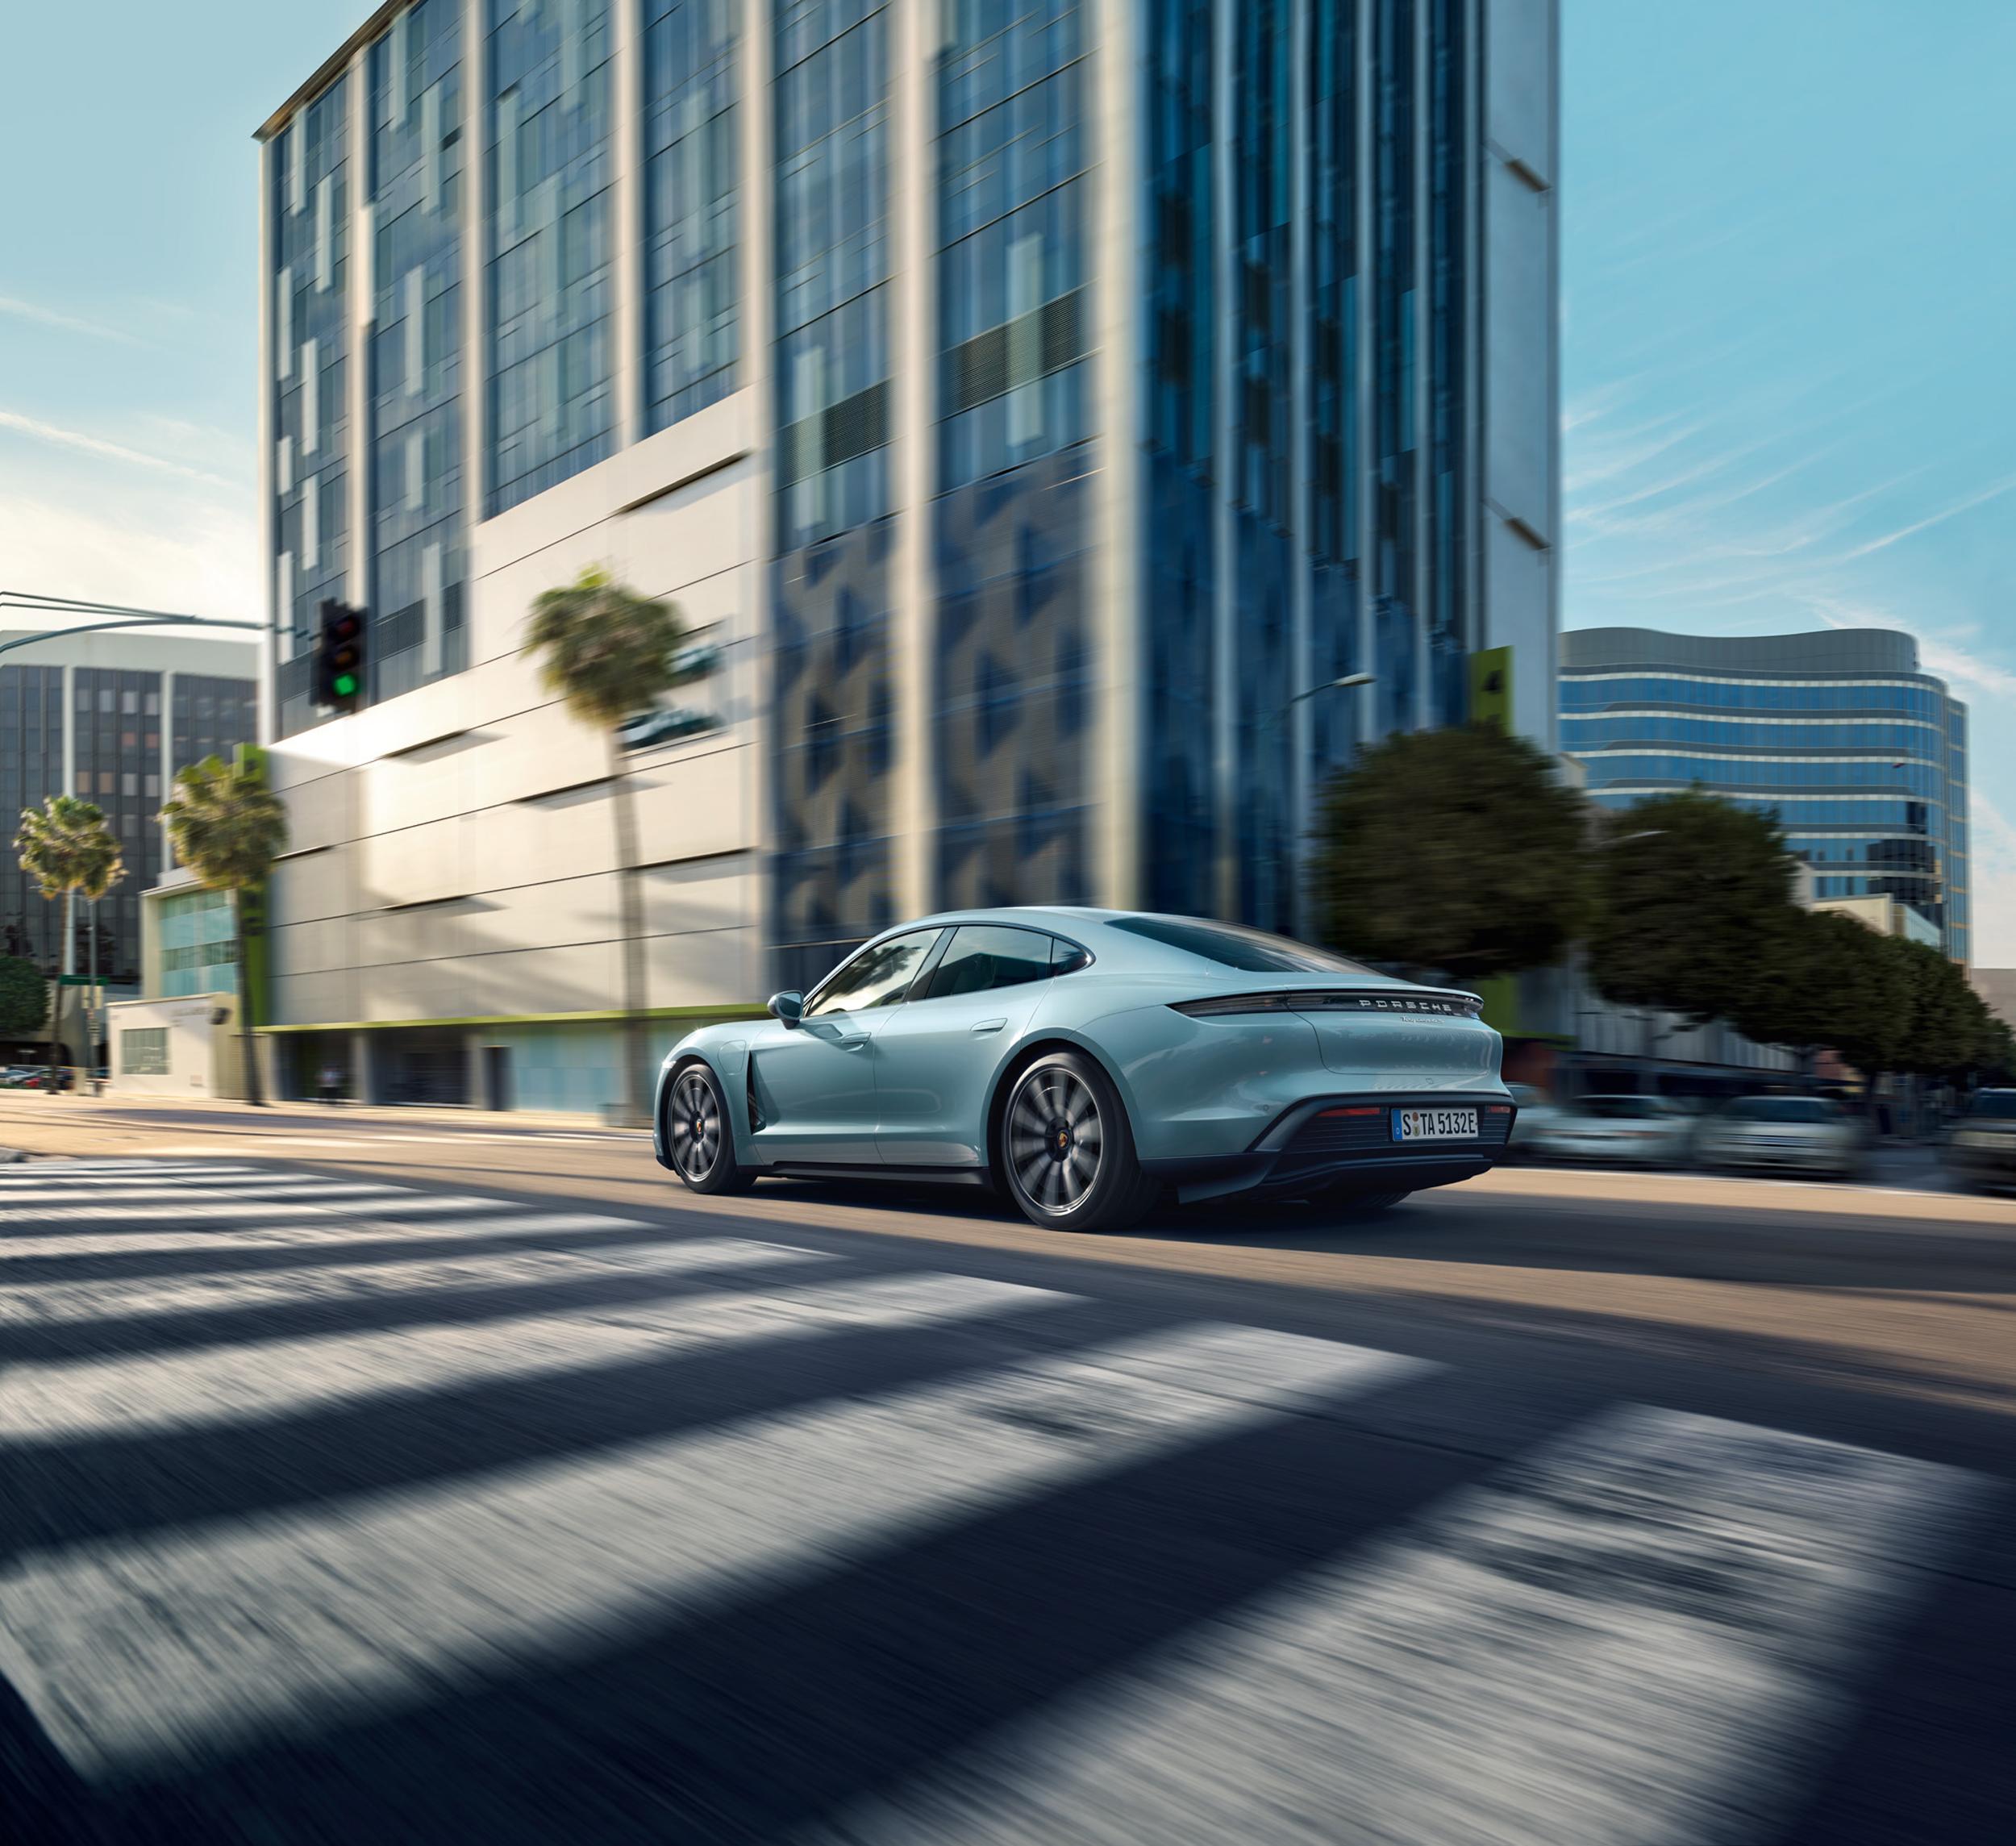 2020 Porsche Taycan 4S Specs, Pricing Announced